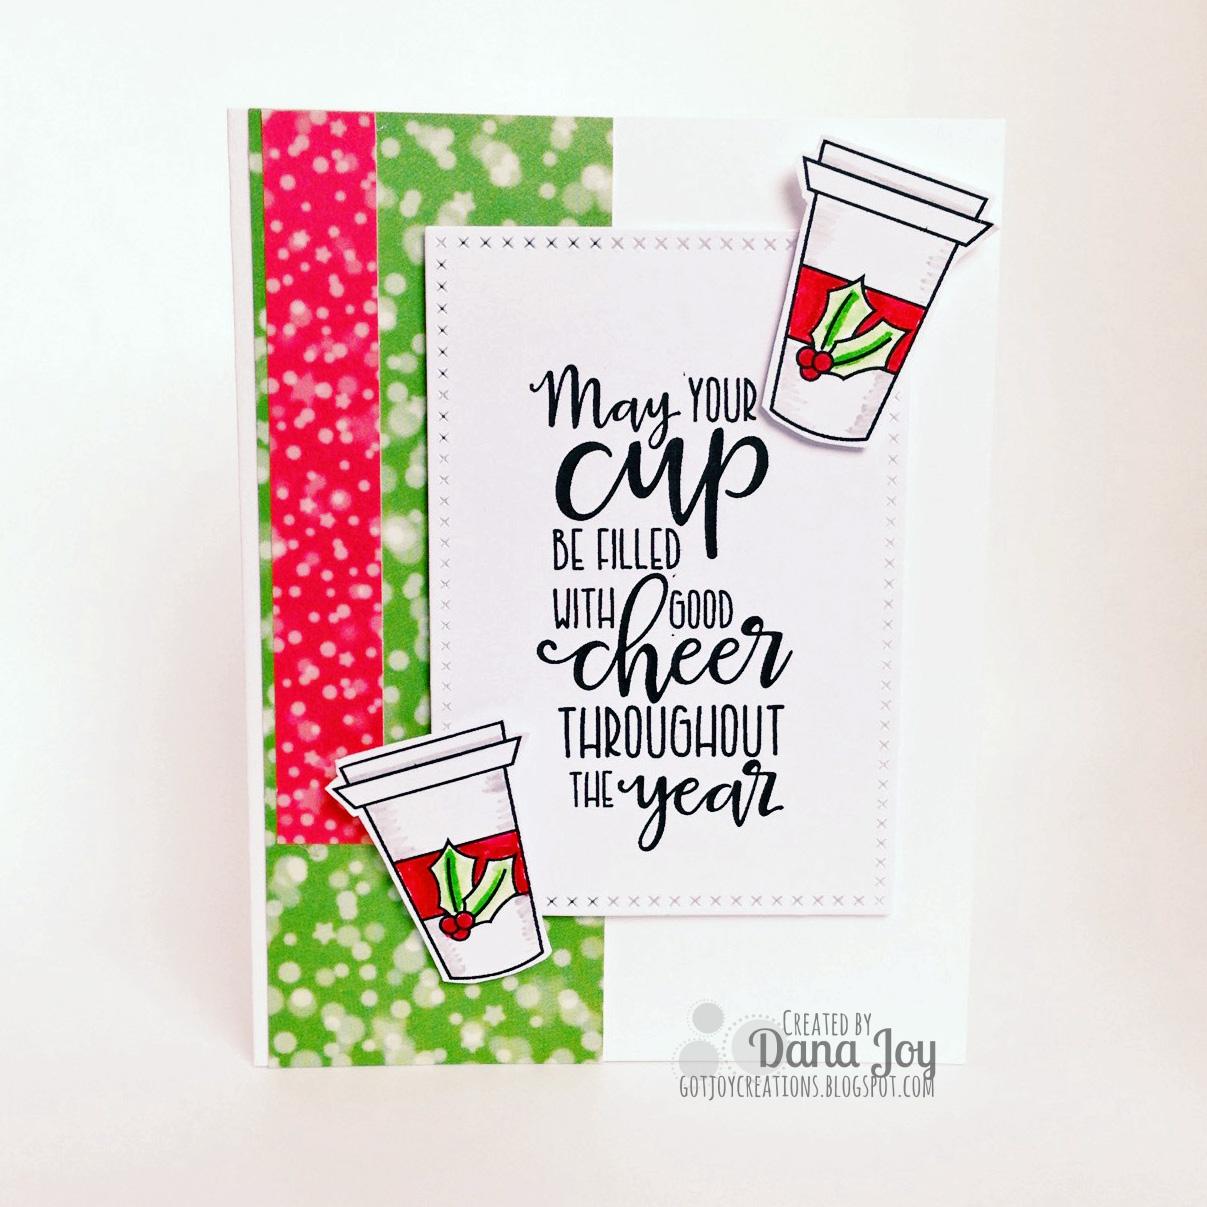 Coffee inspired holiday card got joy creations by dana joy coffee inspired holiday card kristyandbryce Choice Image